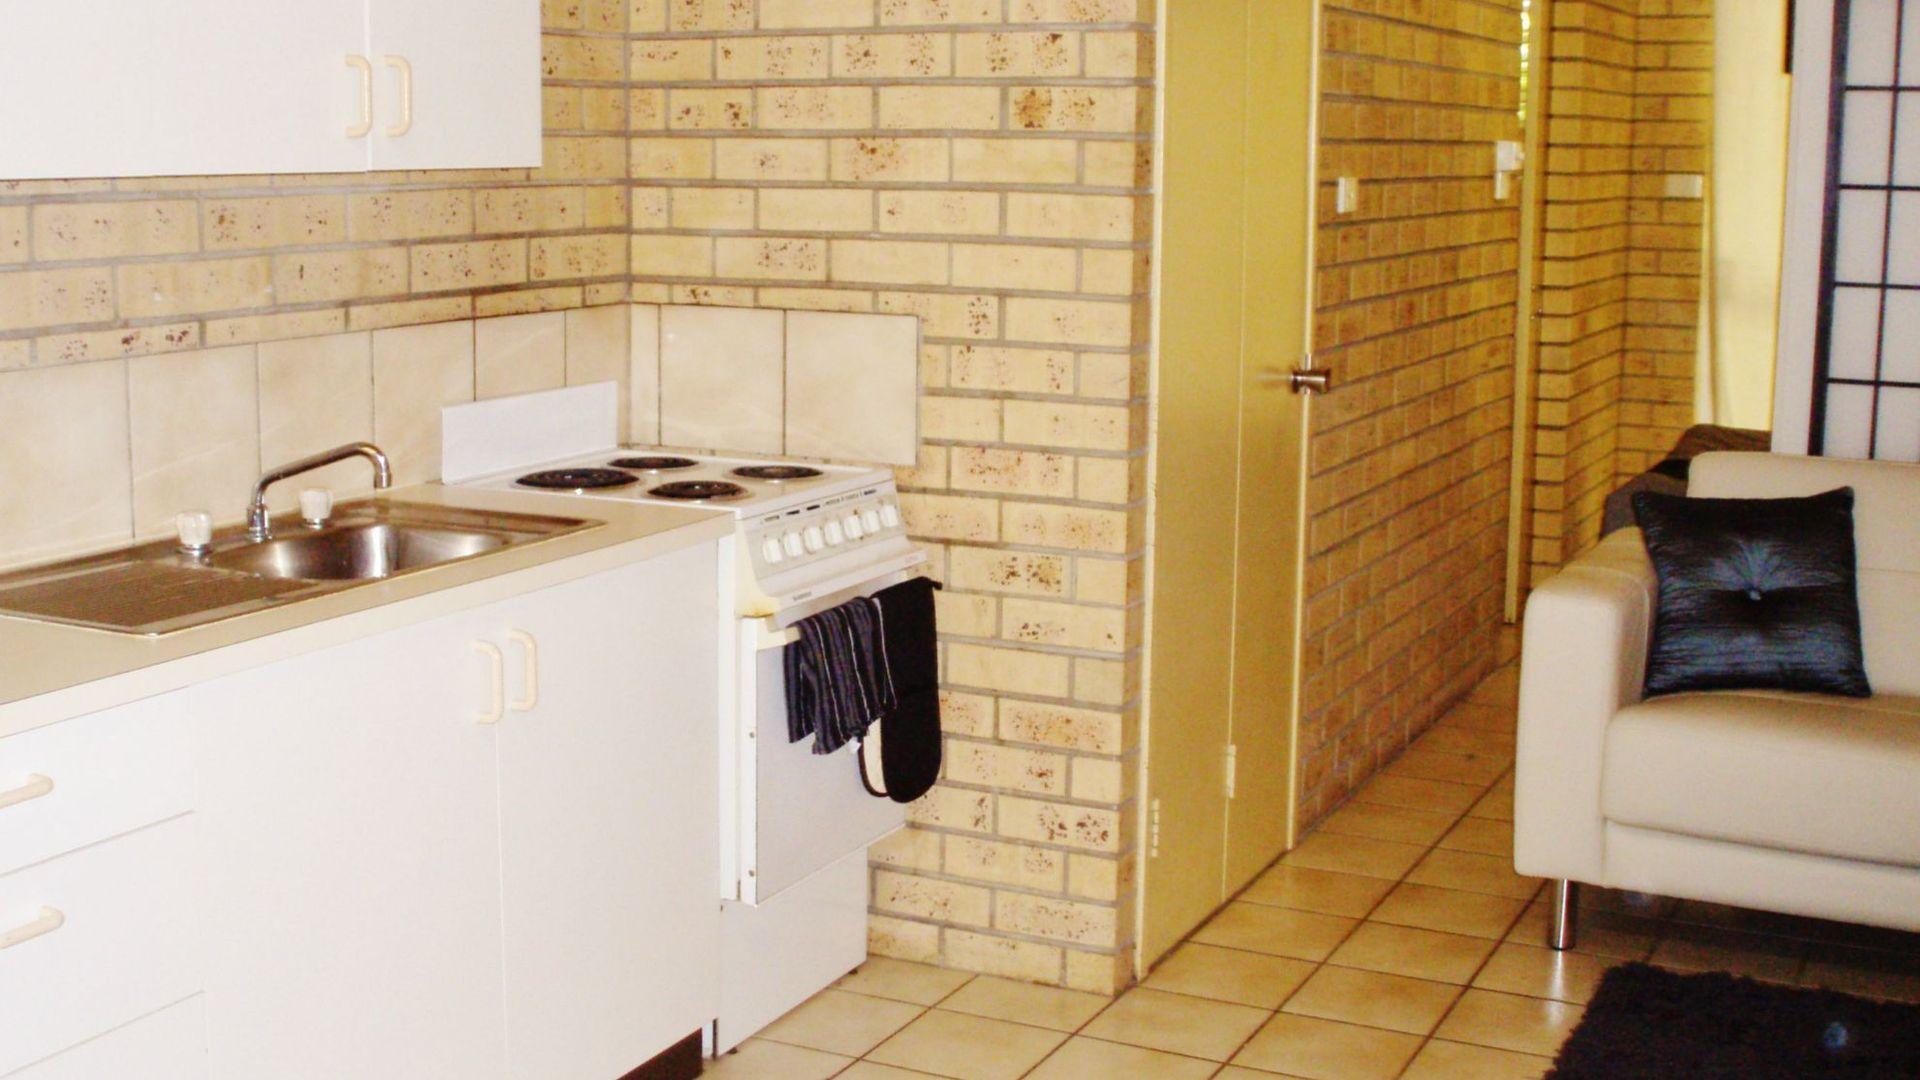 17/25 CONLEY Street, Ayr QLD 4807, Image 2